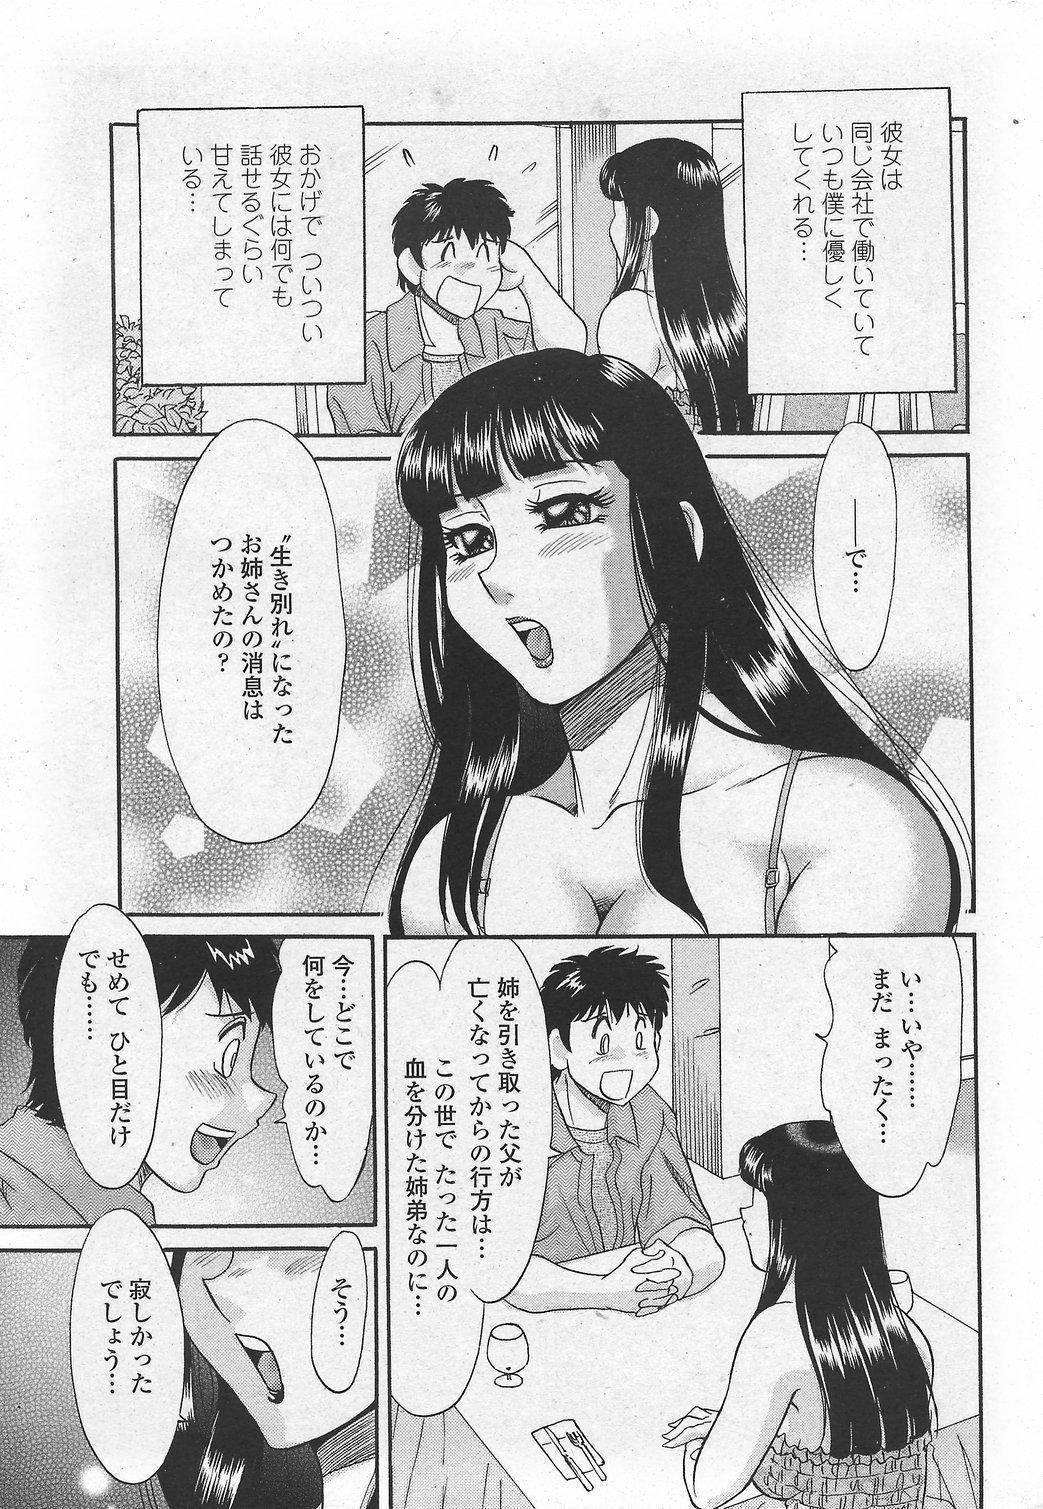 COMIC Penguin Club Sanzokuban 2007-10 Vol. 225 24